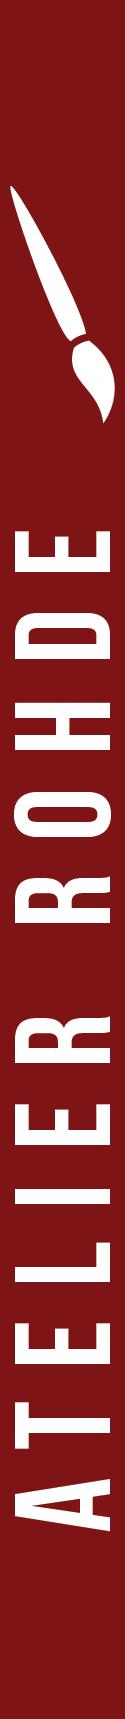 Logo Yette Rohde